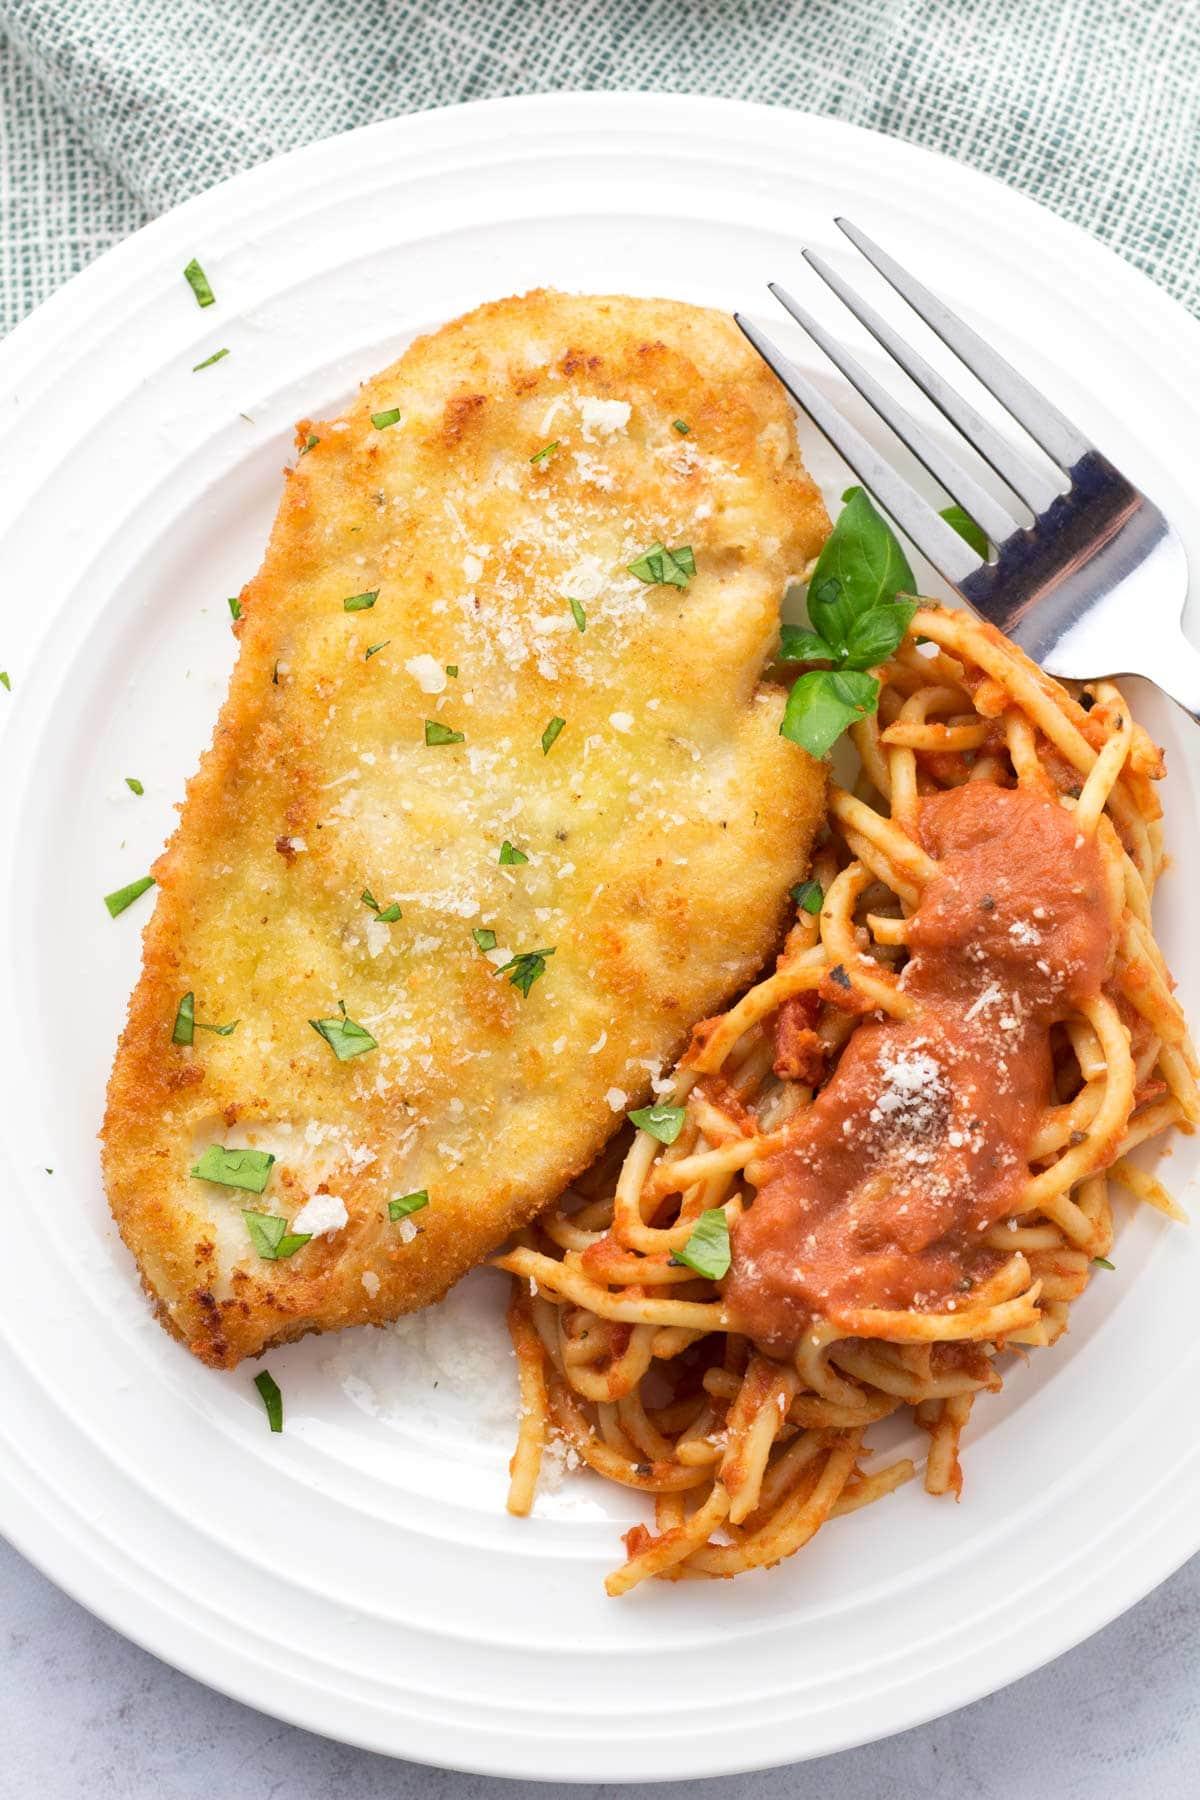 Plate of Cheesecake Factory Romano Chicken and spaghetti.